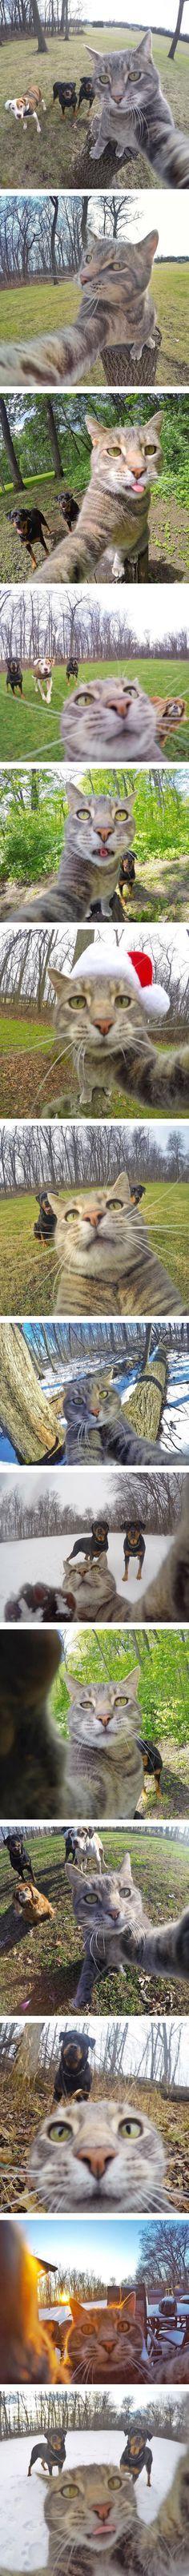 Meet Manny: The Selfie Taking Cat